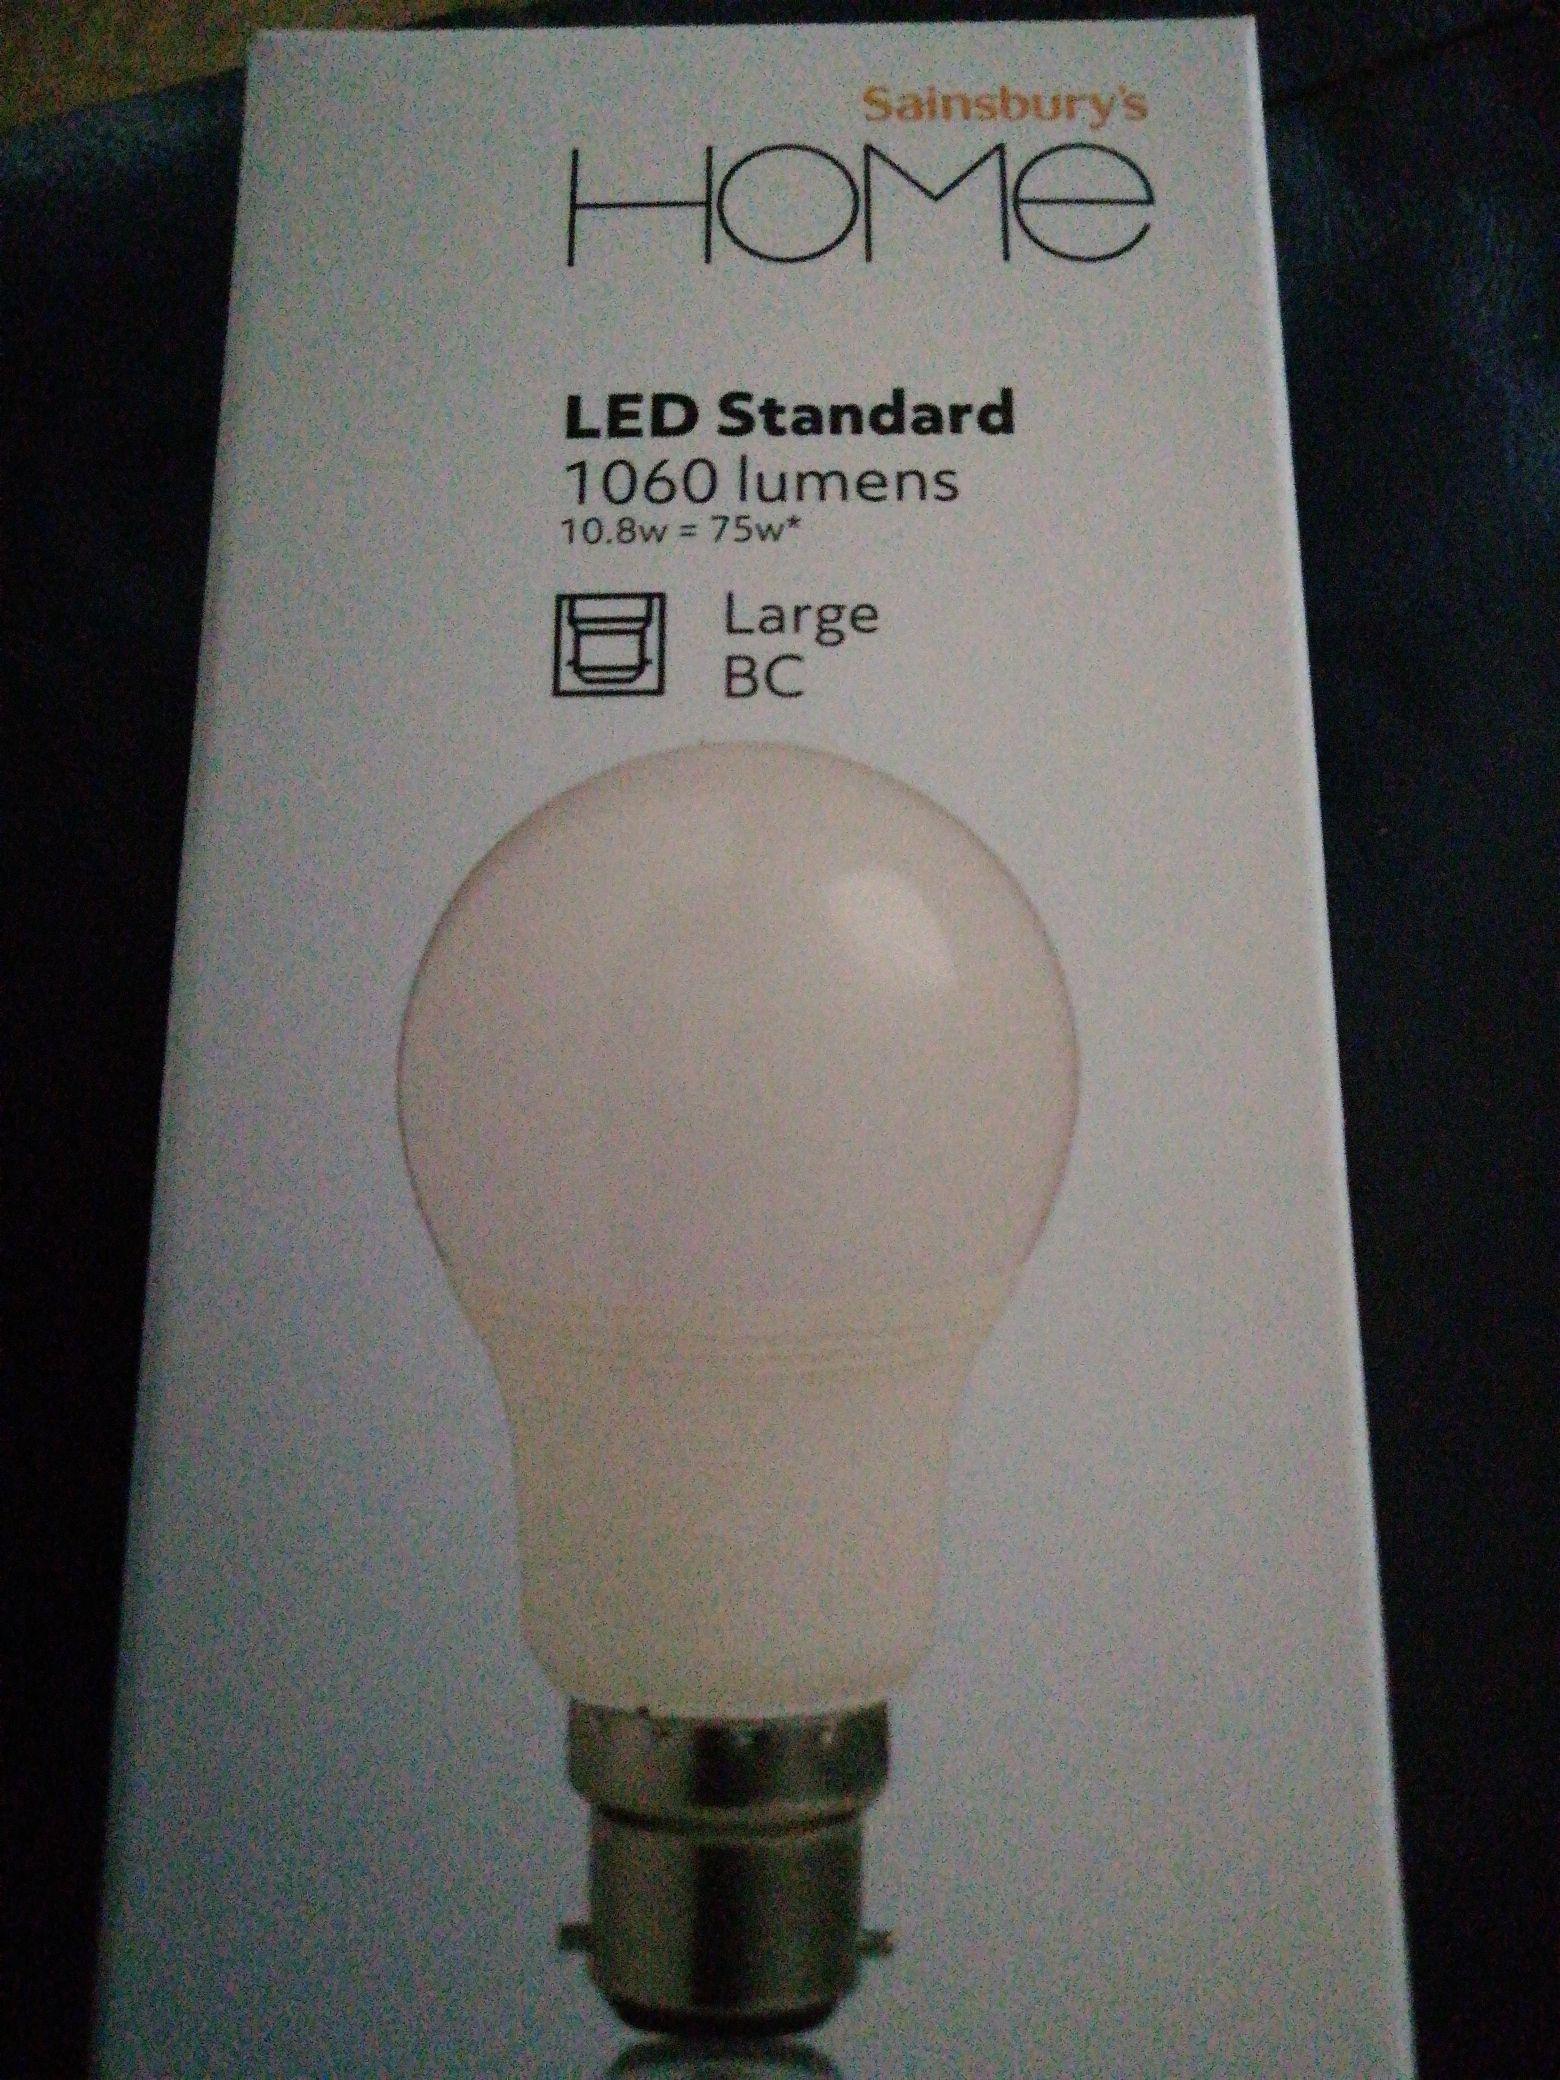 Led Standard light bulb EC instore at Sainsbury's for 75p